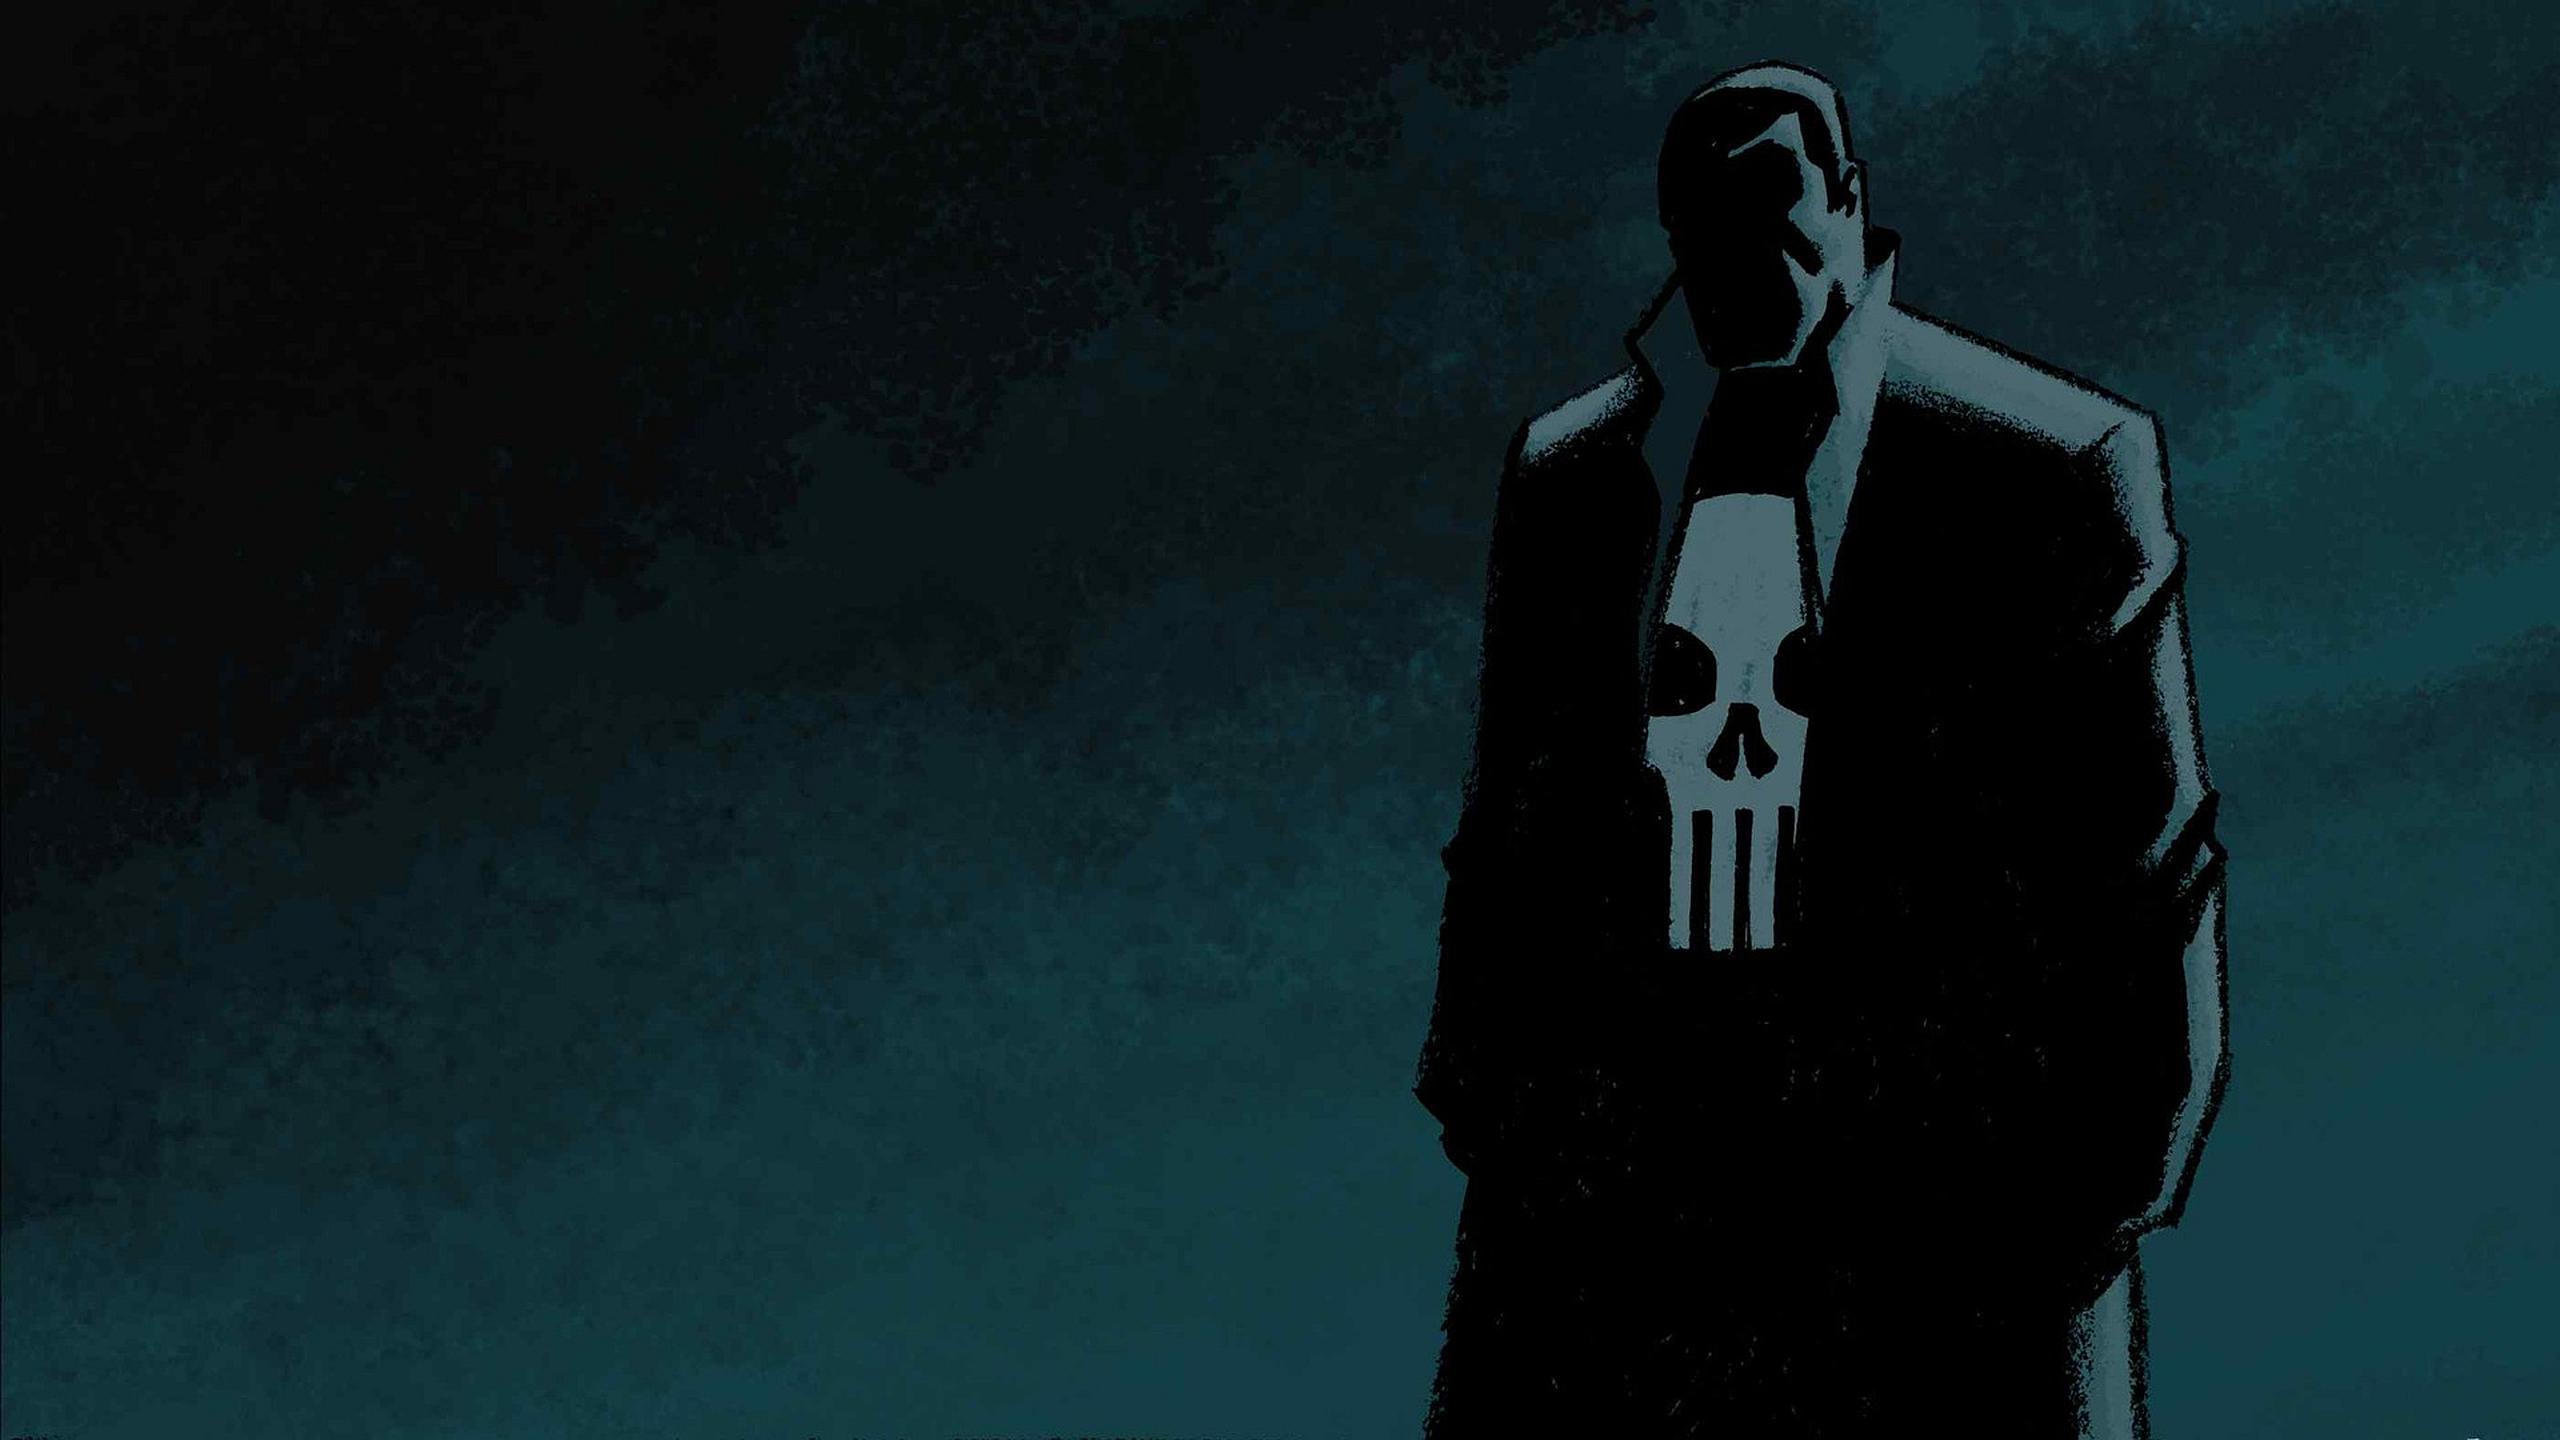 The Punisher Computer Wallpapers, Desktop Backgrounds | 2560×1440 …